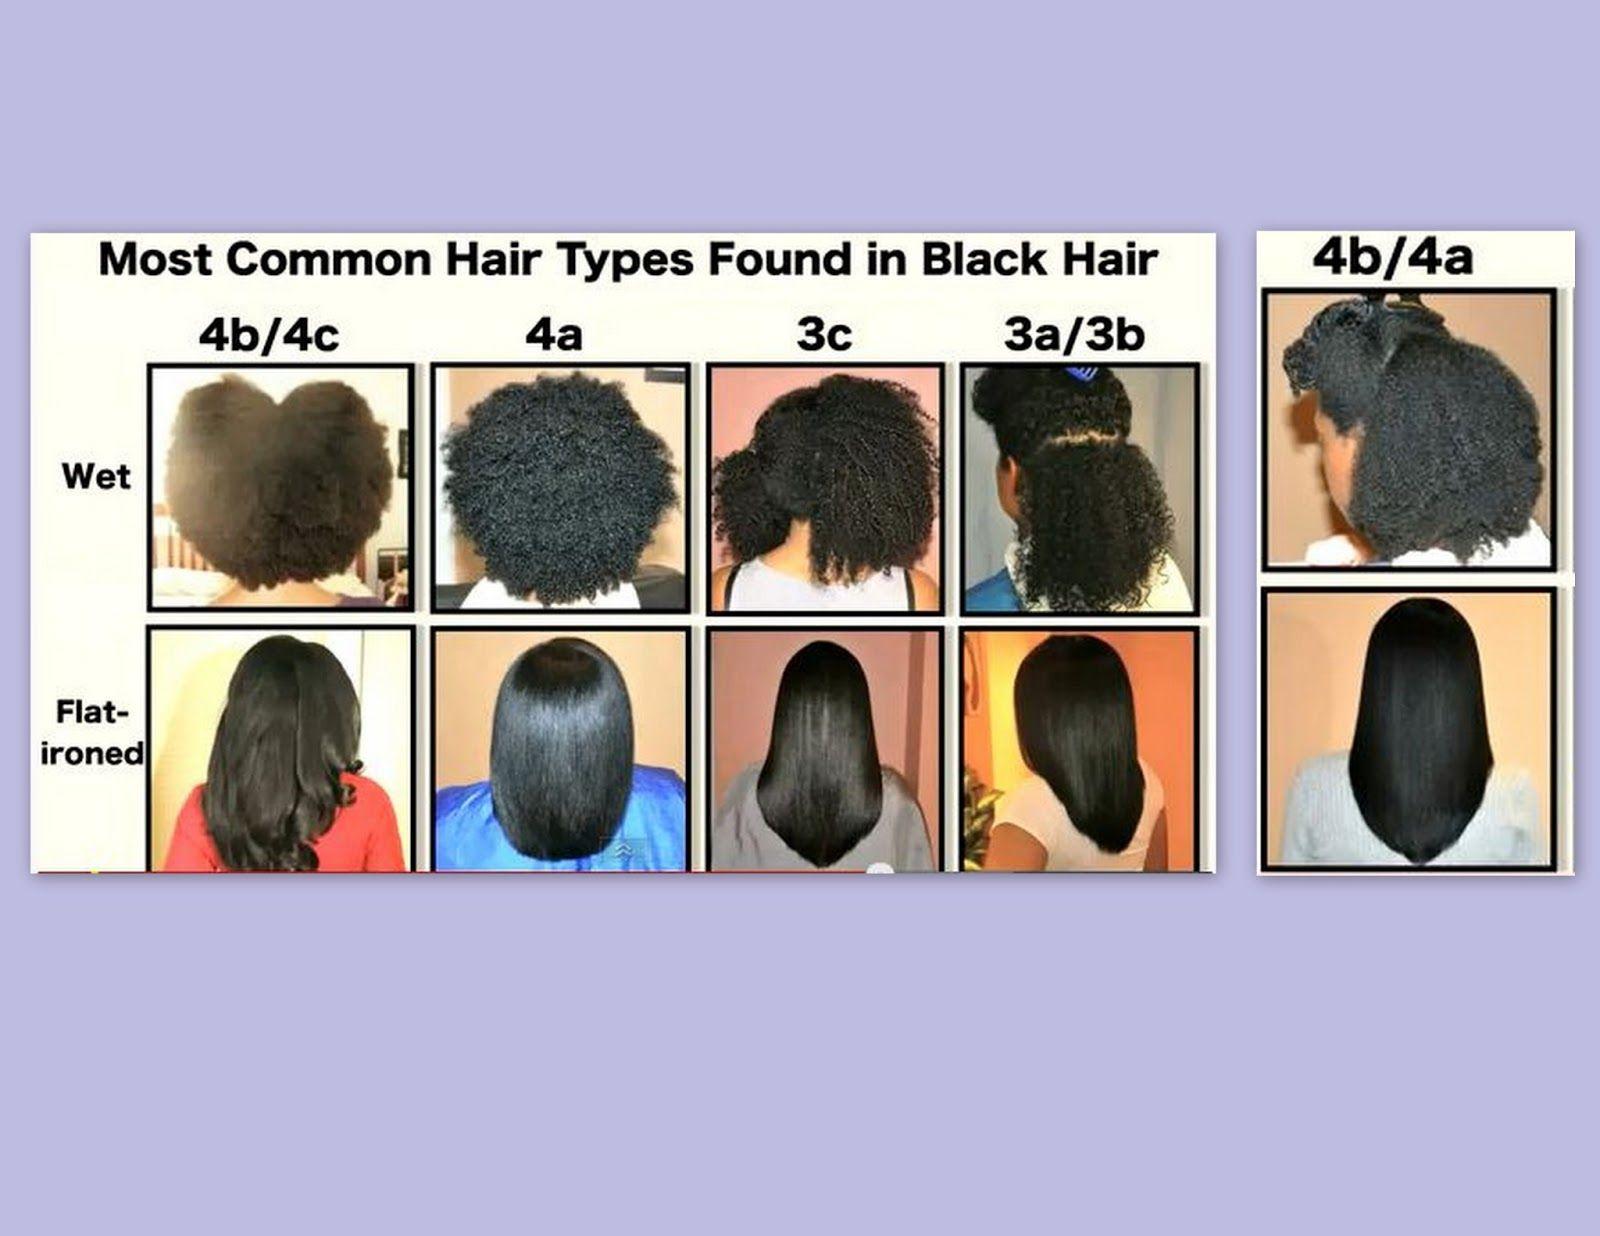 Pin By Armoni On Hair Natural Hair Styles Hair Wont Grow Natural Hair Types